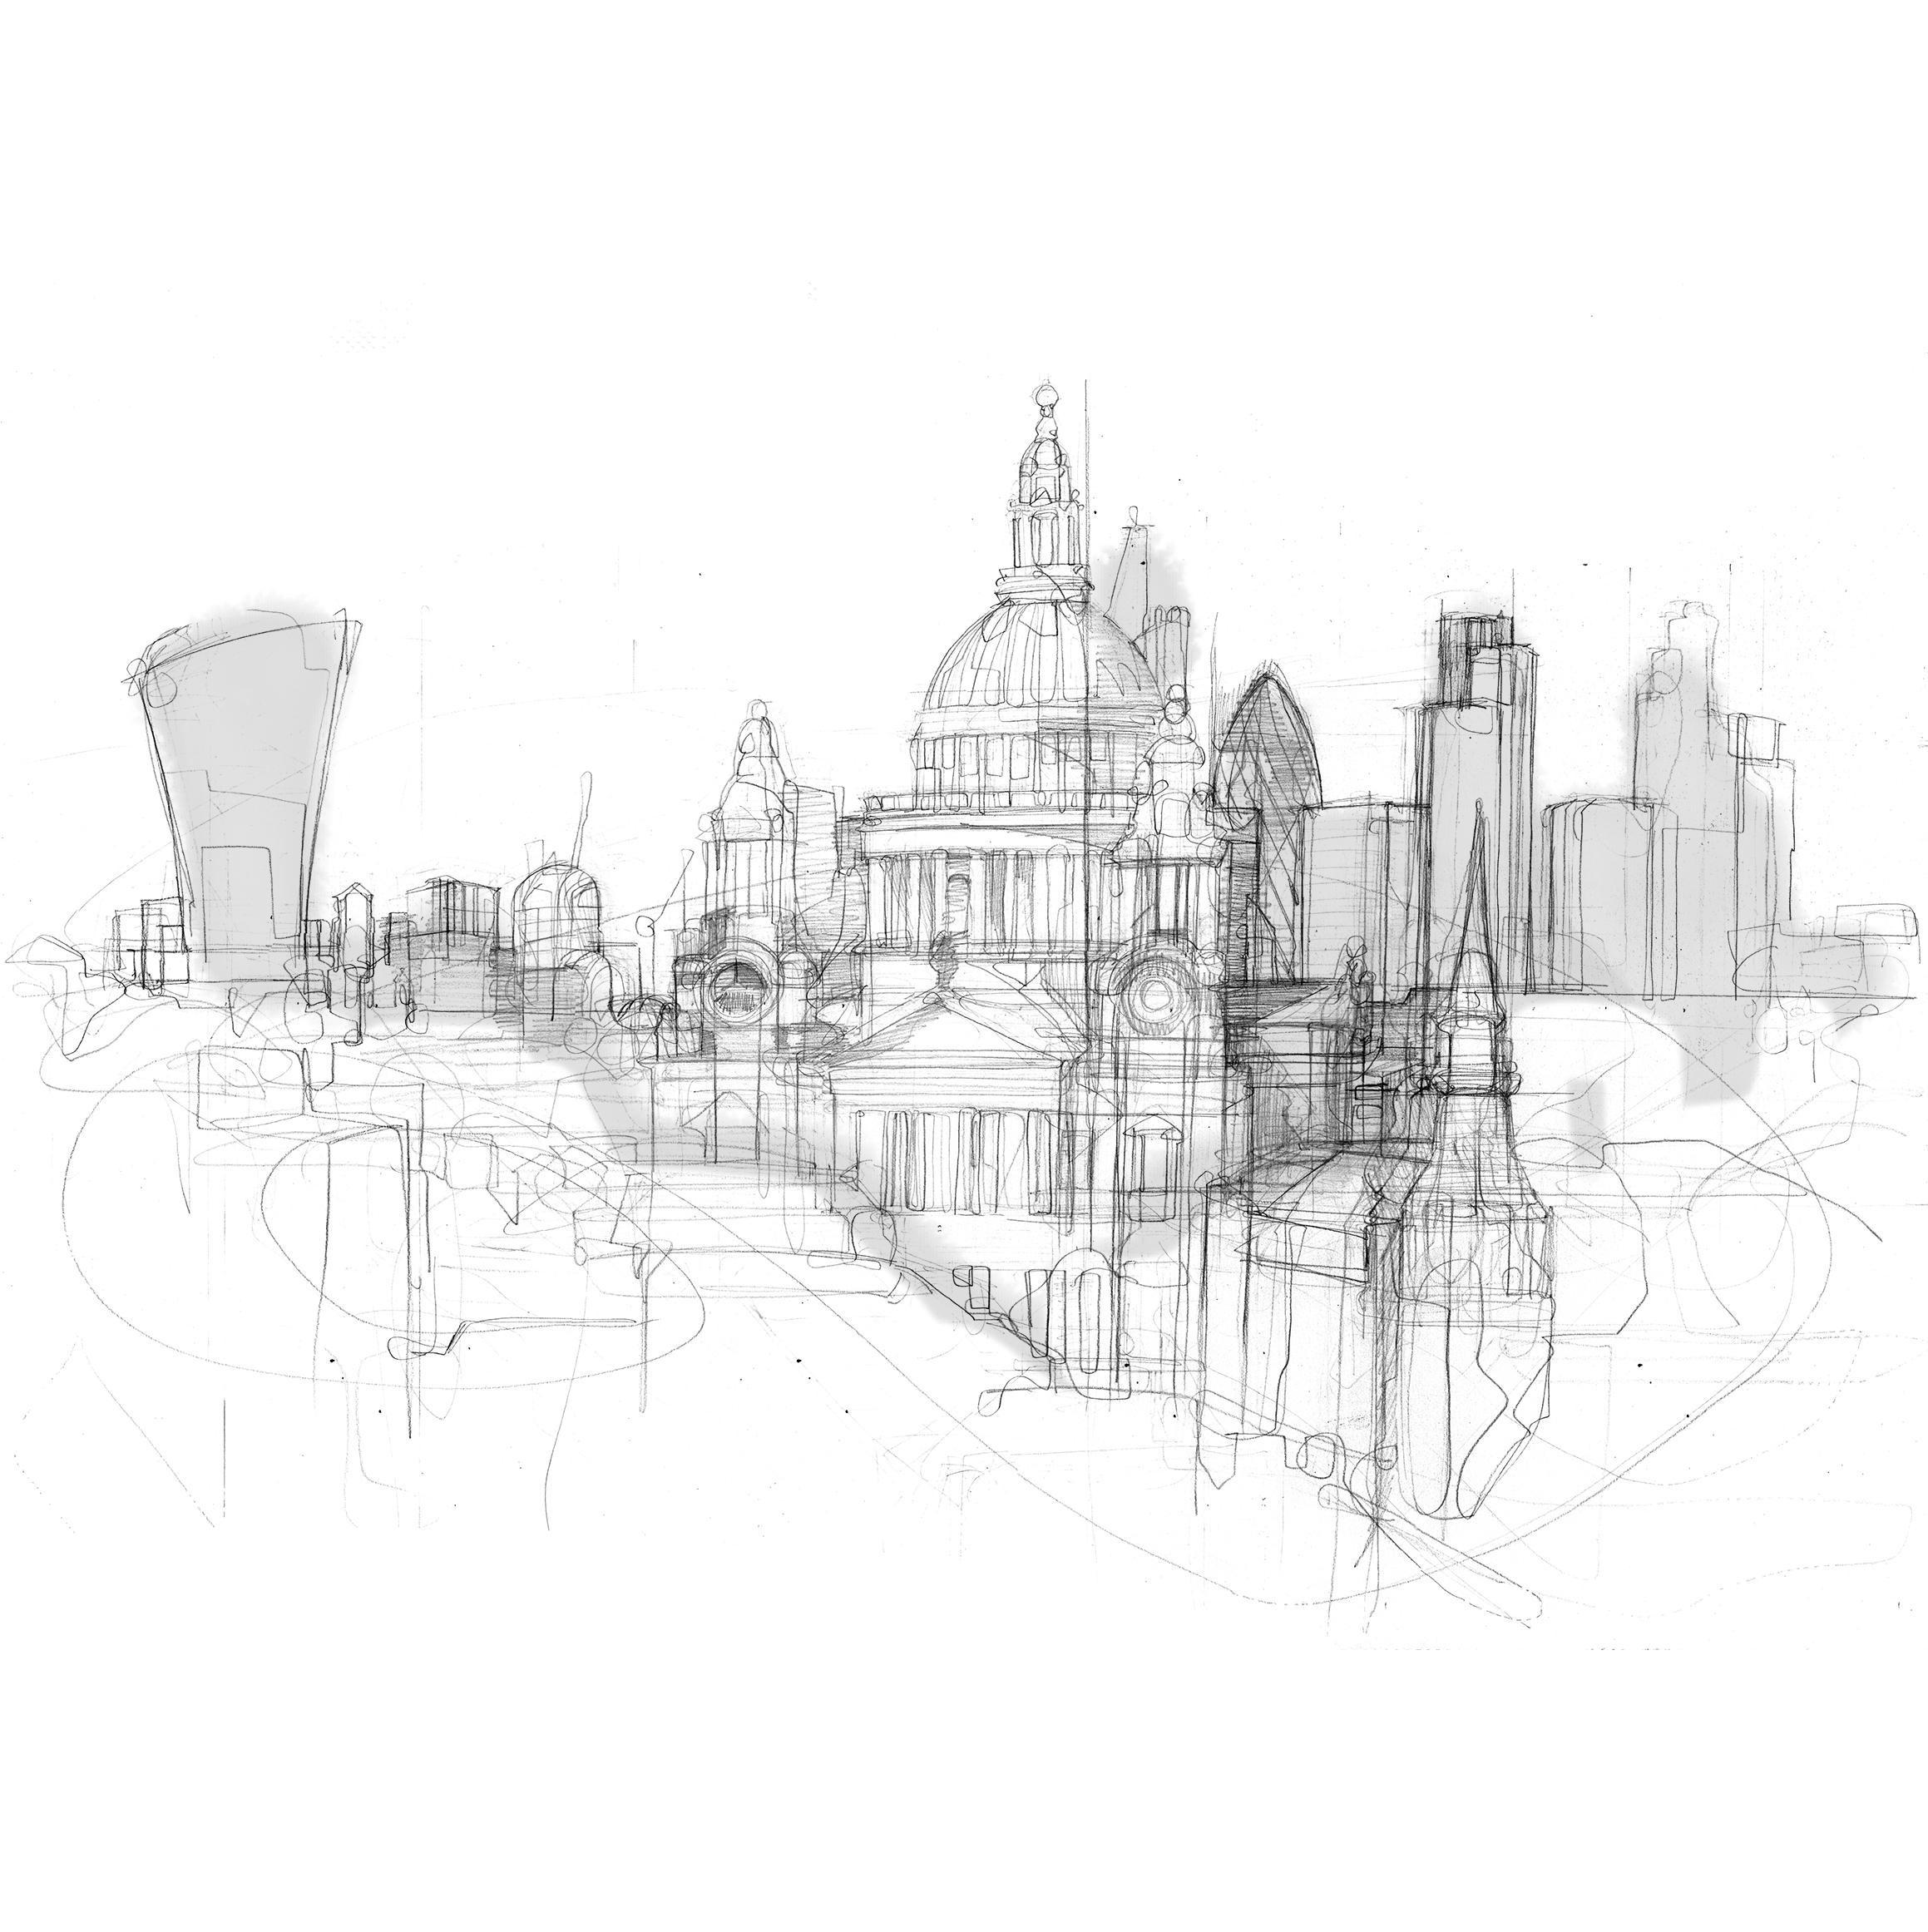 london sketch 2b.jpg